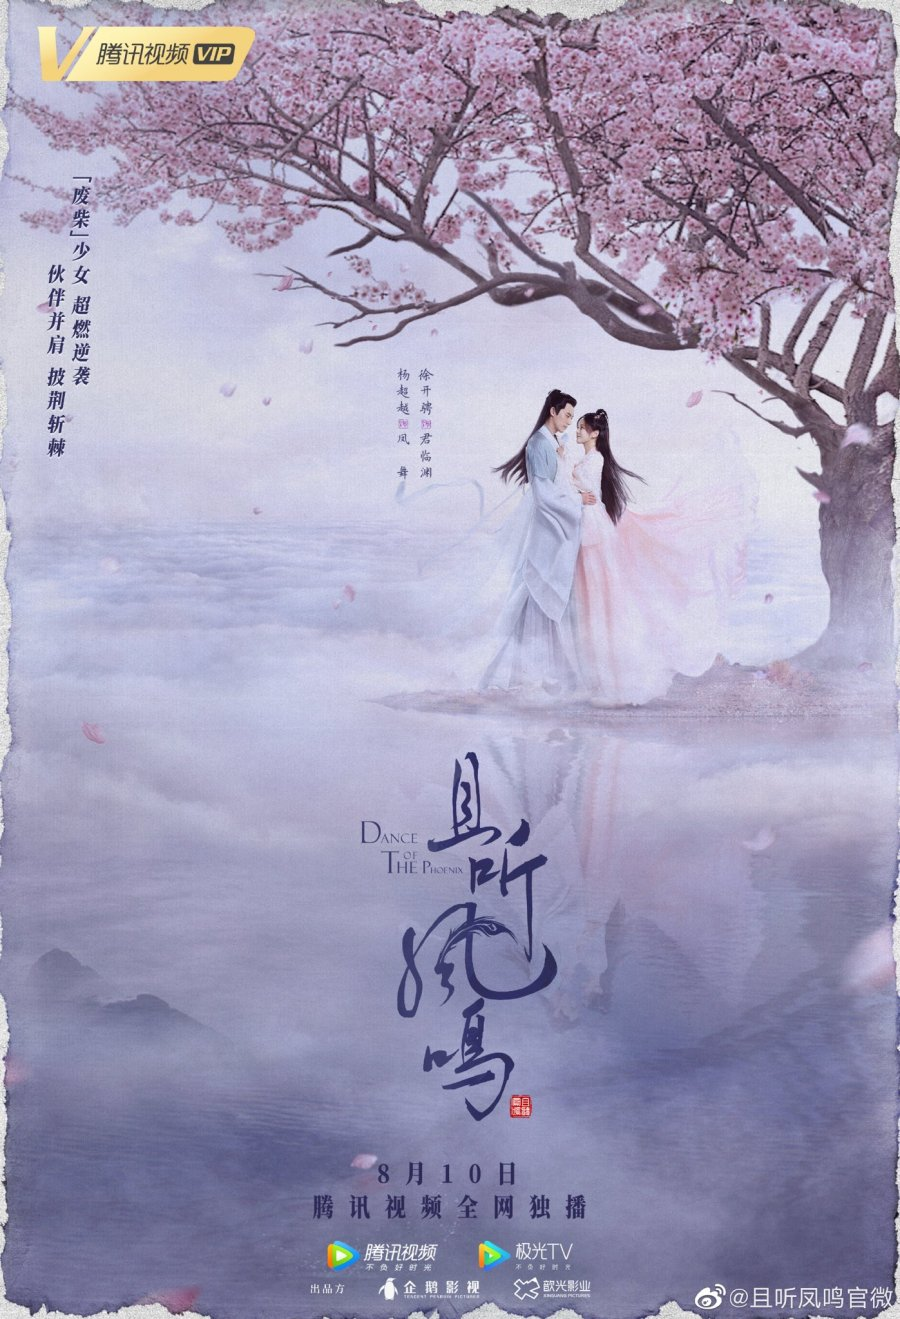 QleeY 4f - Танец феникса ✦ 2020 ✦ Китай